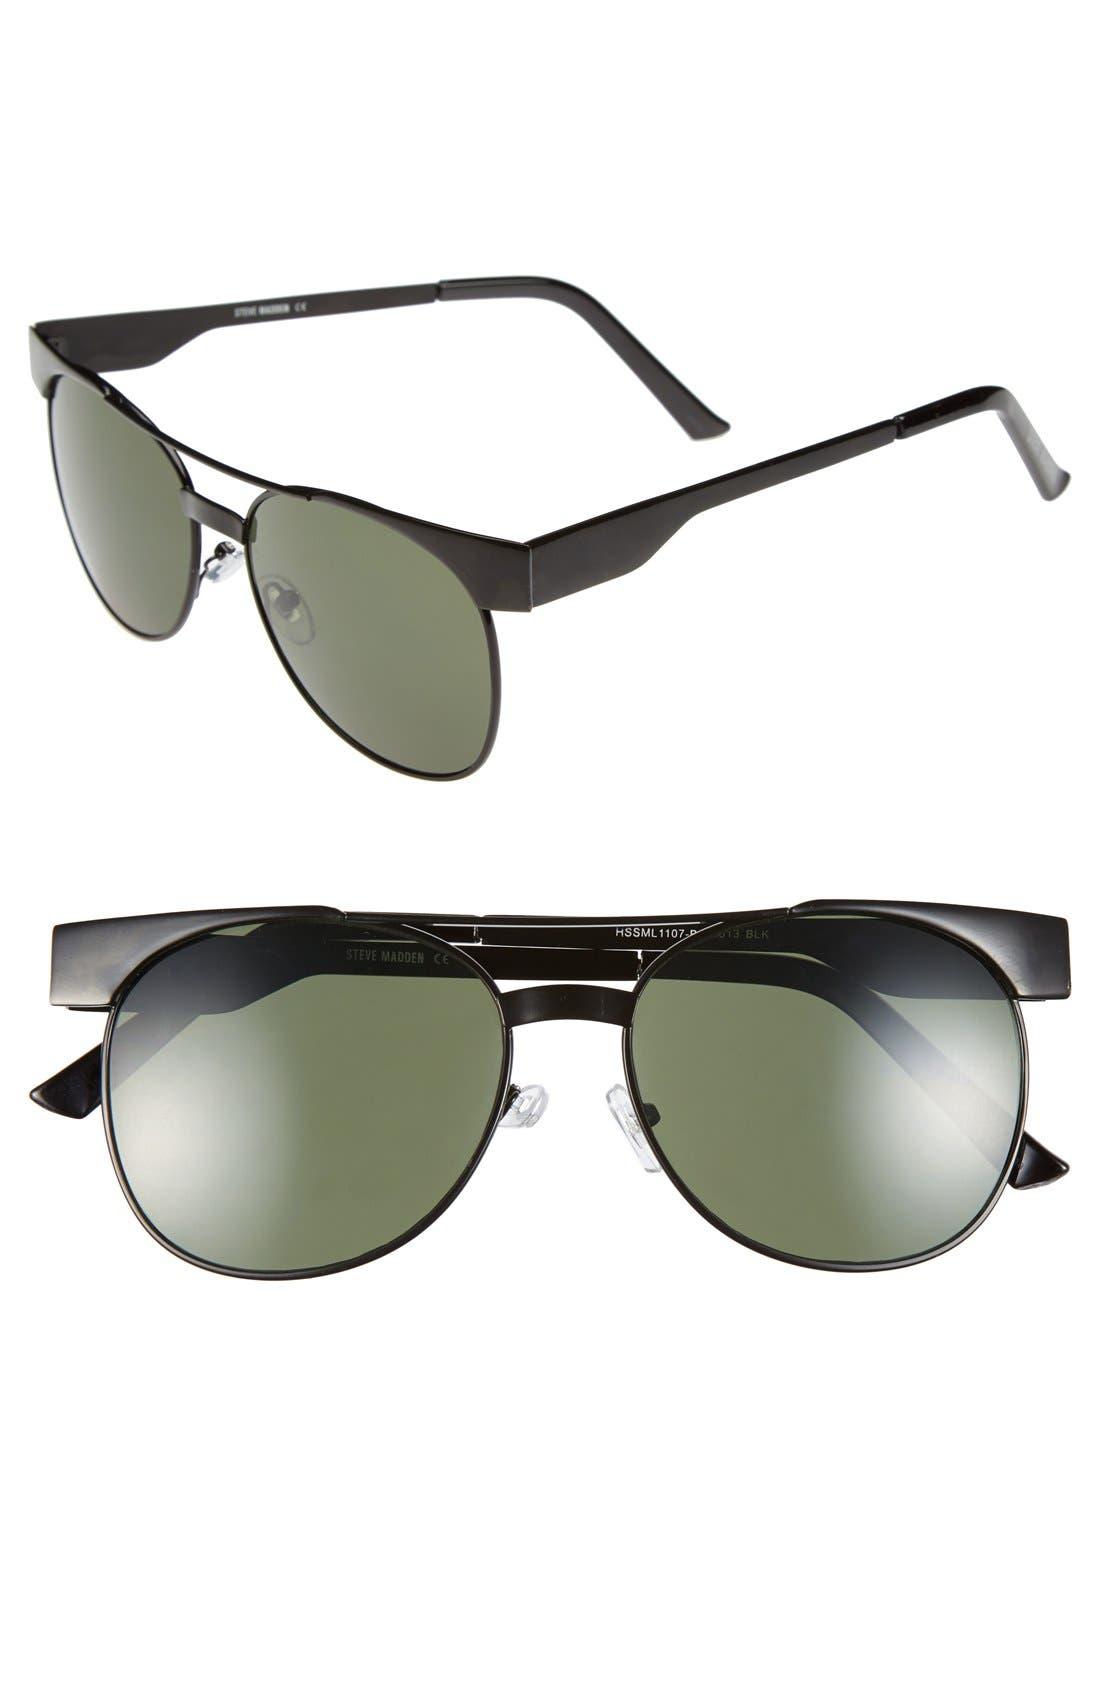 Main Image - Steve Madden 54mm Aviator Sunglasses